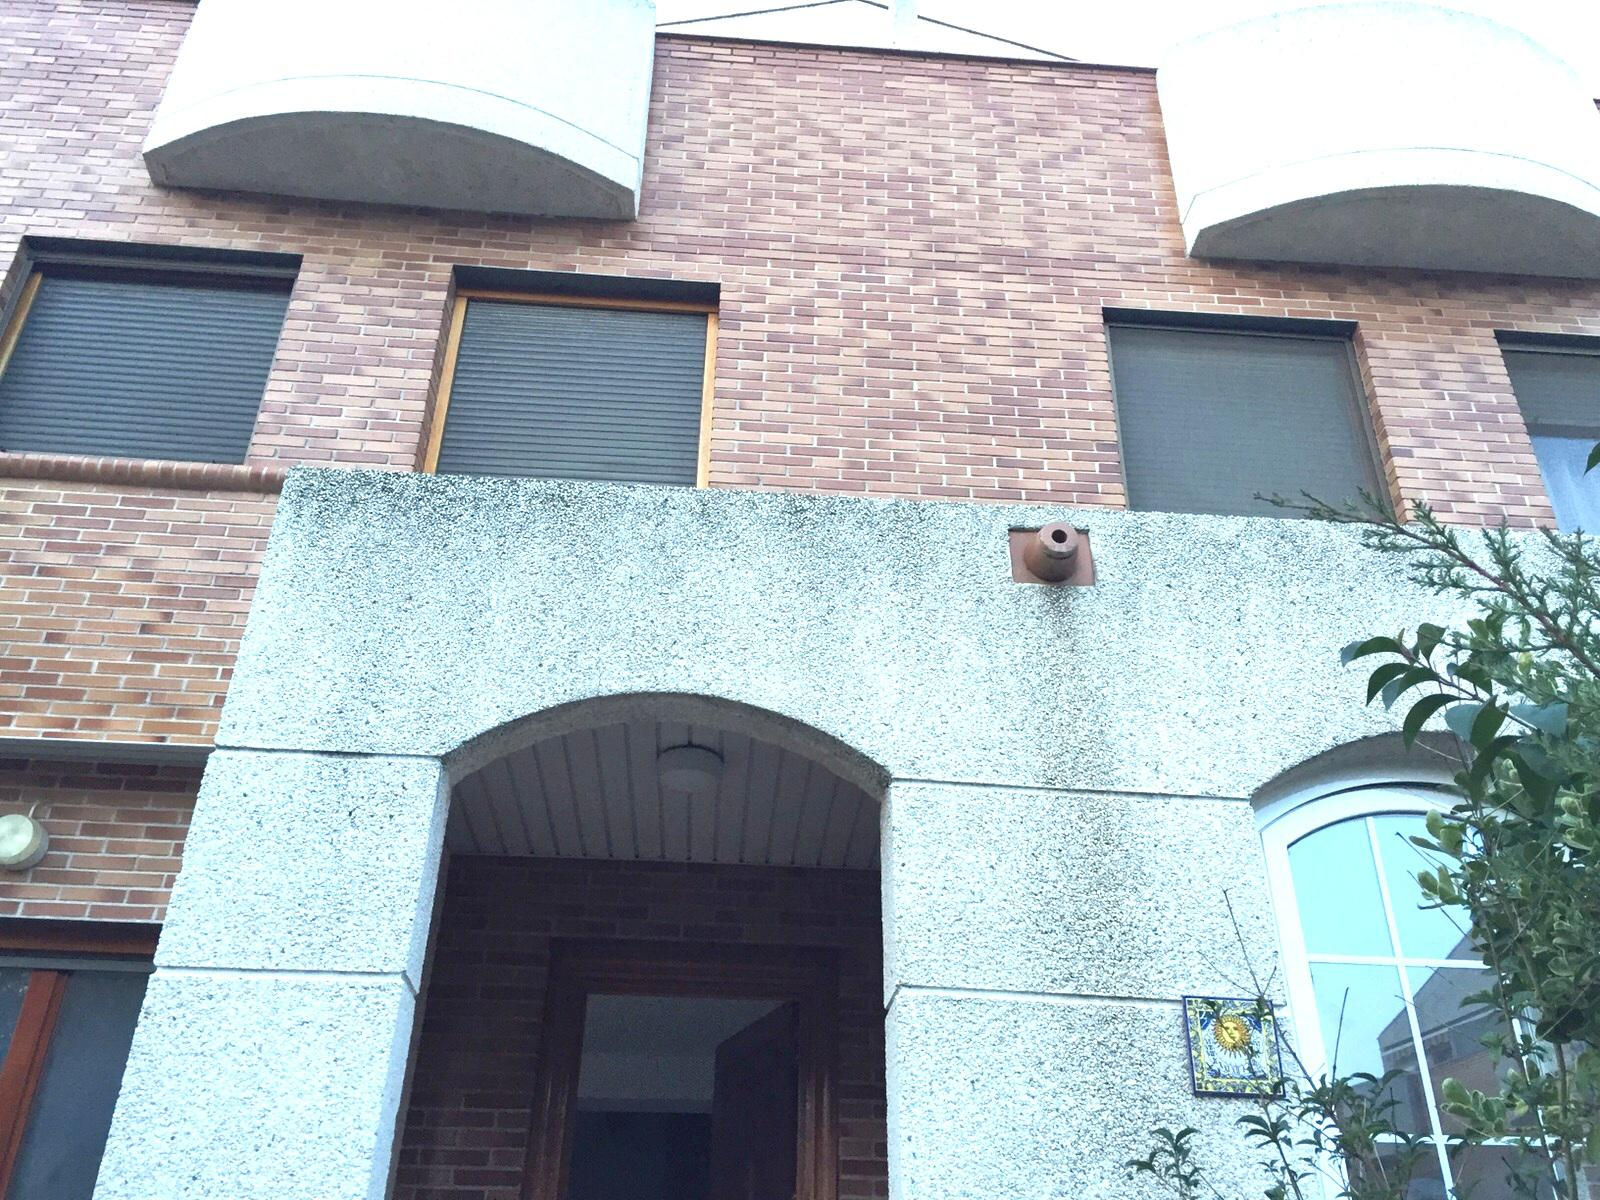 Casa adosada miralbueno zaragoza zaragoza 146555 for Piscina miralbueno